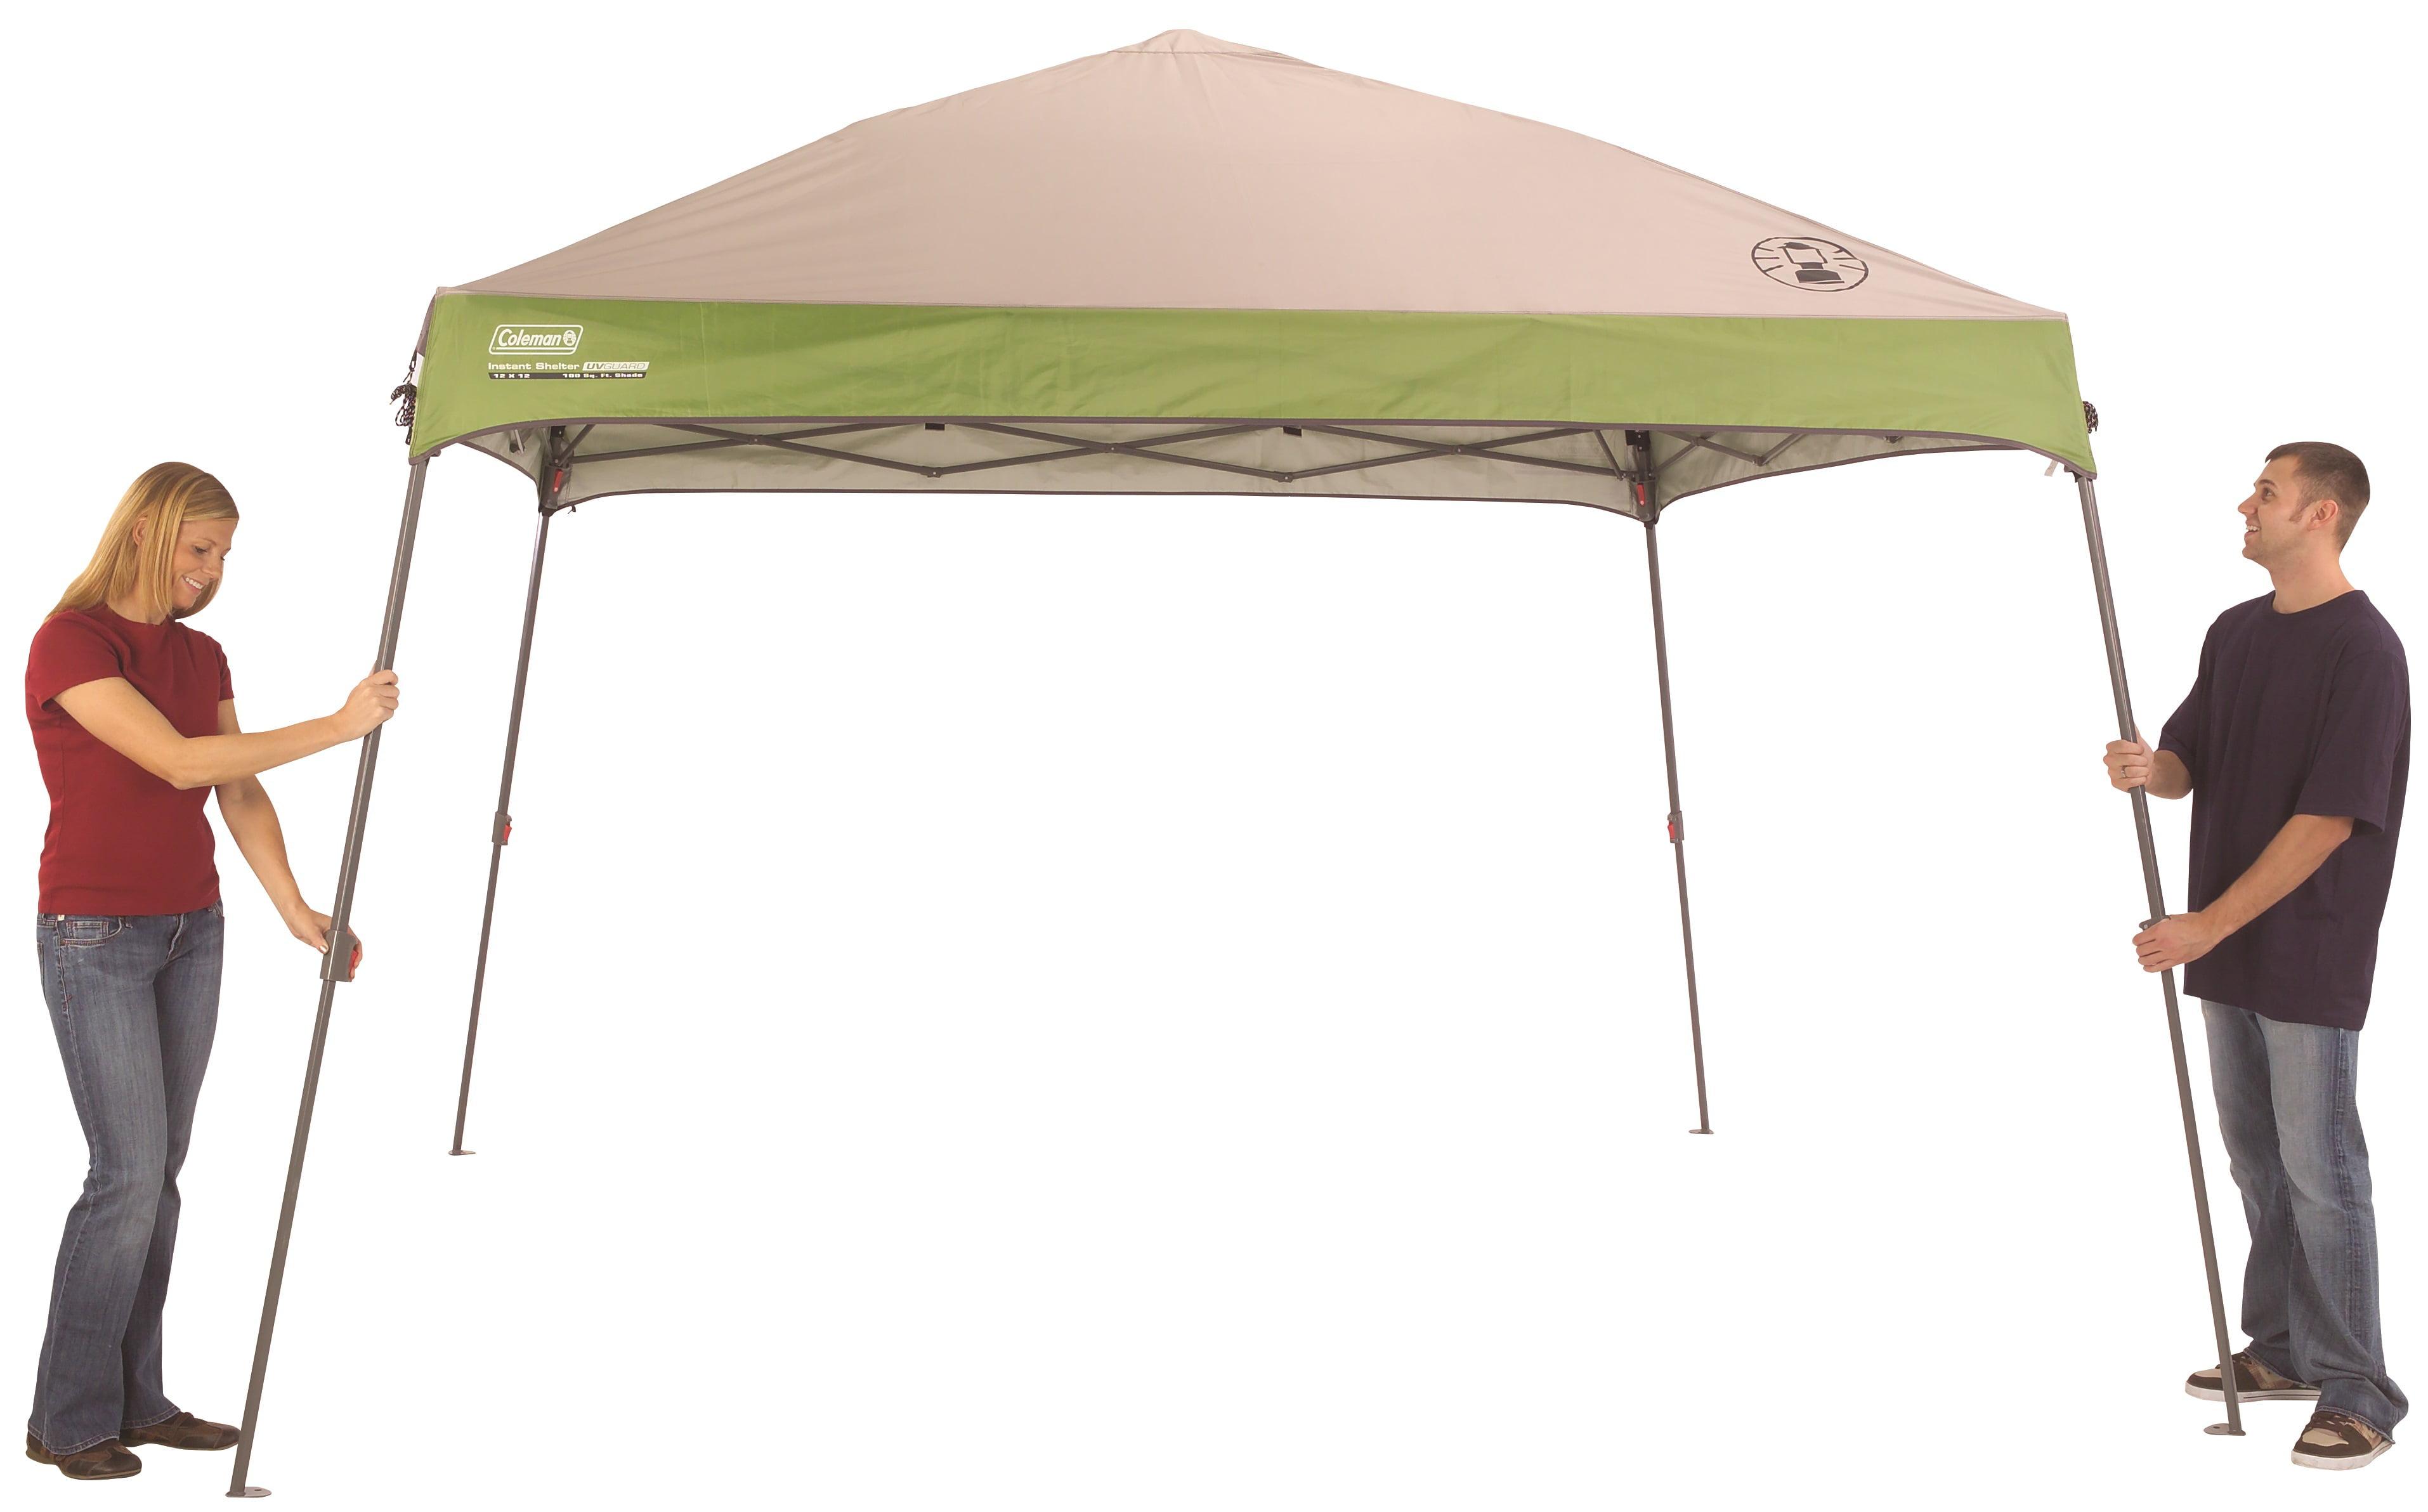 Coleman 12u0027x12u0027 Slant Leg Instant Canopy / Gazebo (144 sq. ft Coverage) - Walmart.com  sc 1 st  Walmart & Coleman 12u0027x12u0027 Slant Leg Instant Canopy / Gazebo (144 sq. ft ...